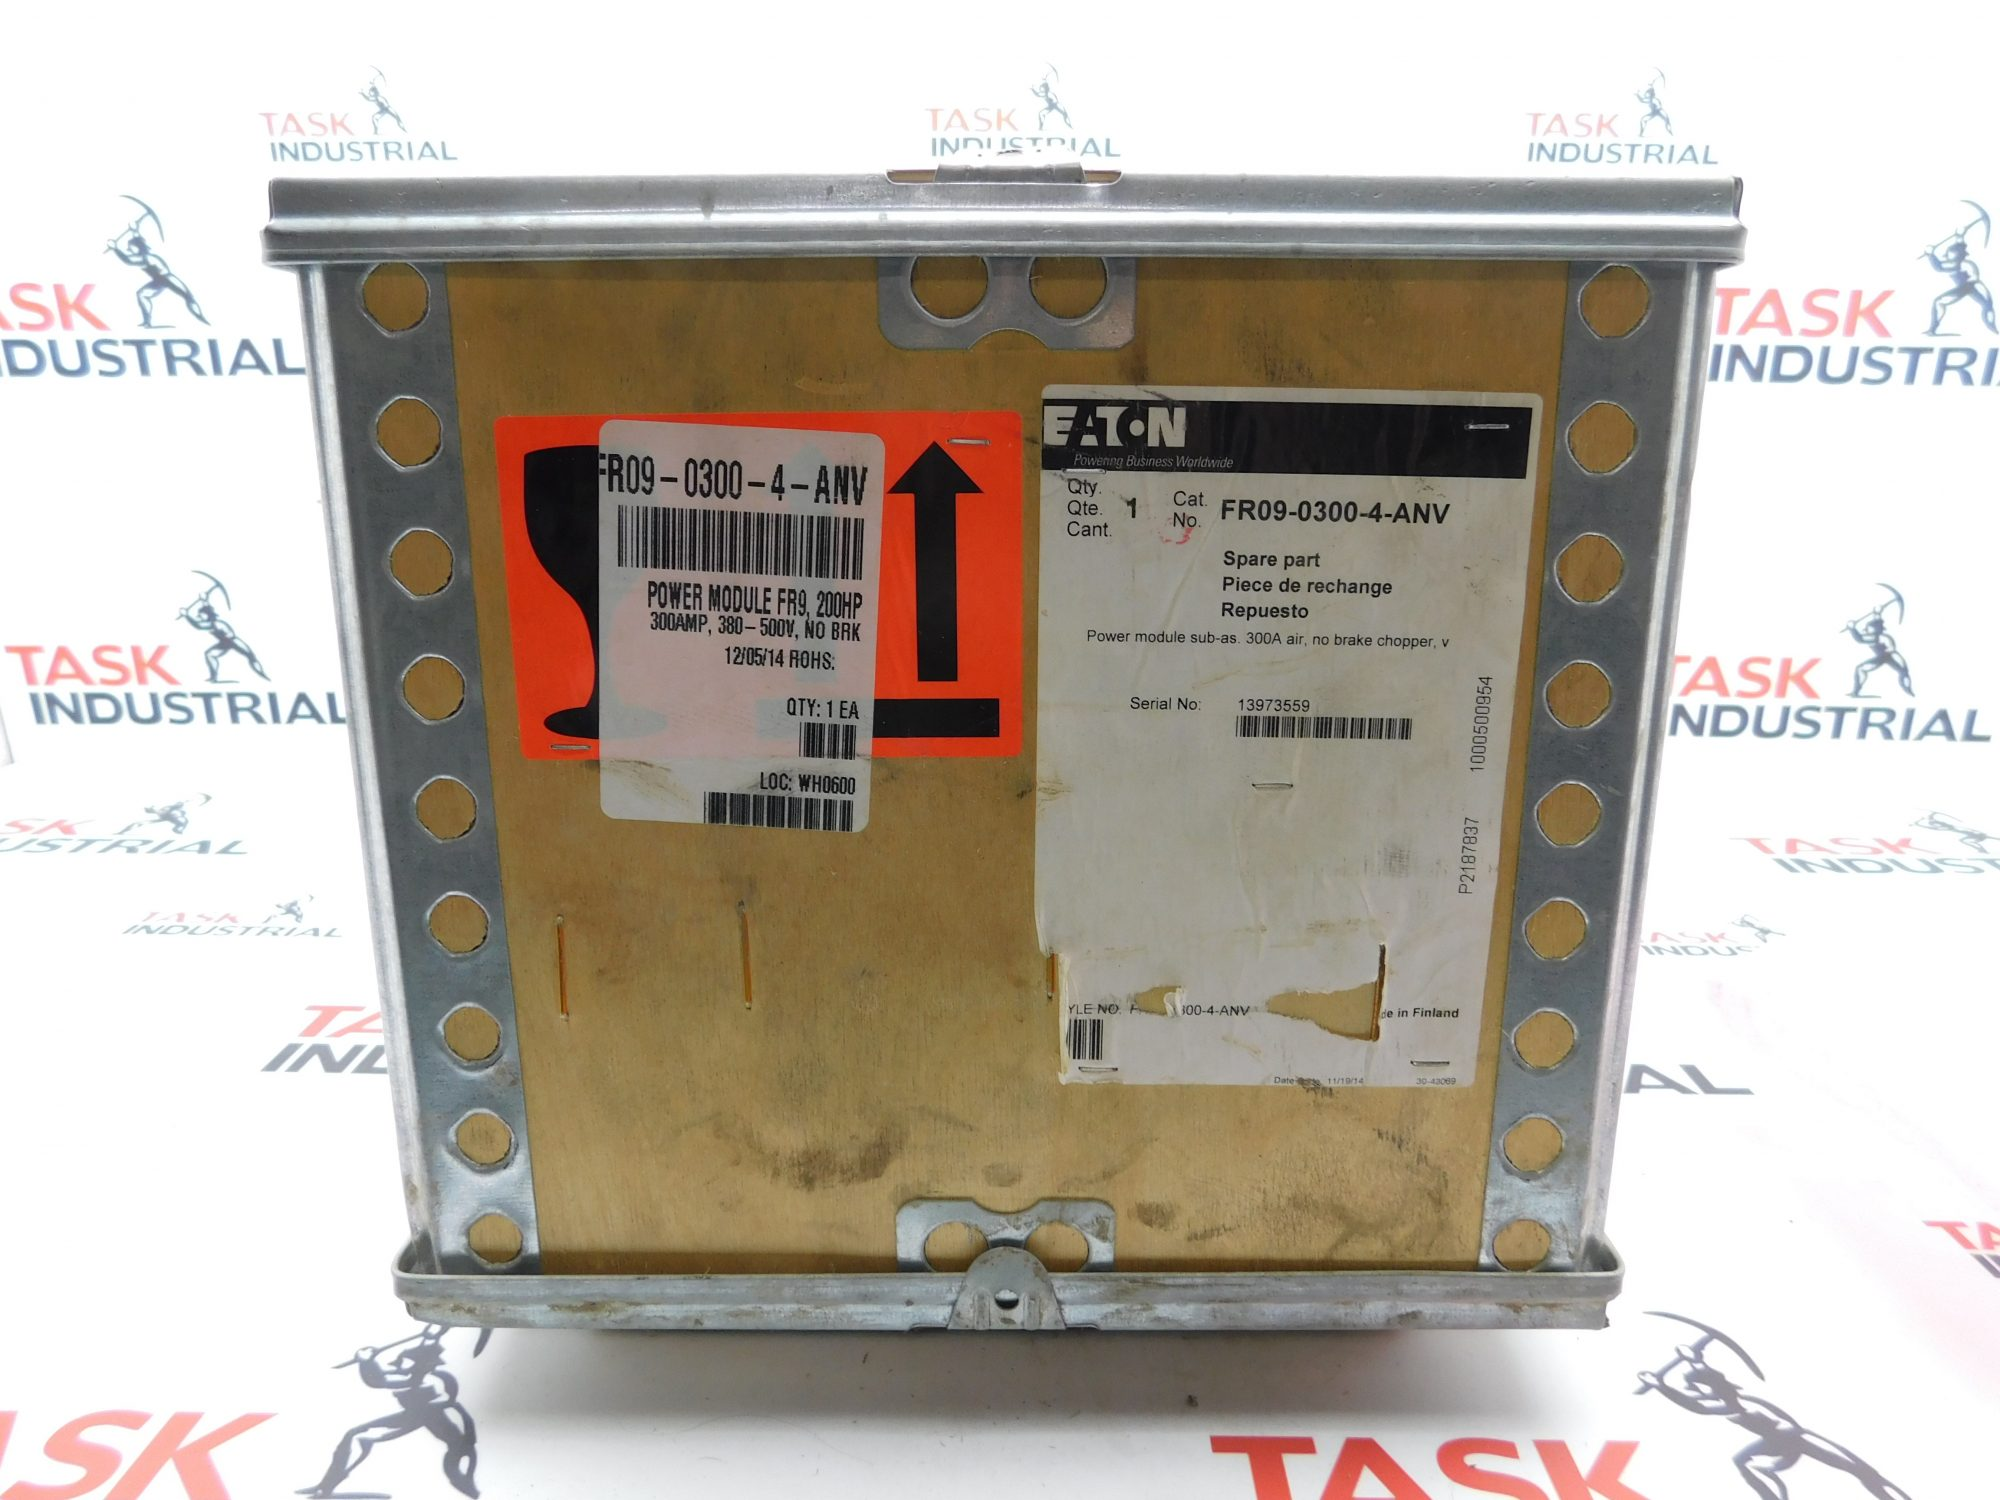 Eaton FR09-0300-4-ANV Spare Part Power Module